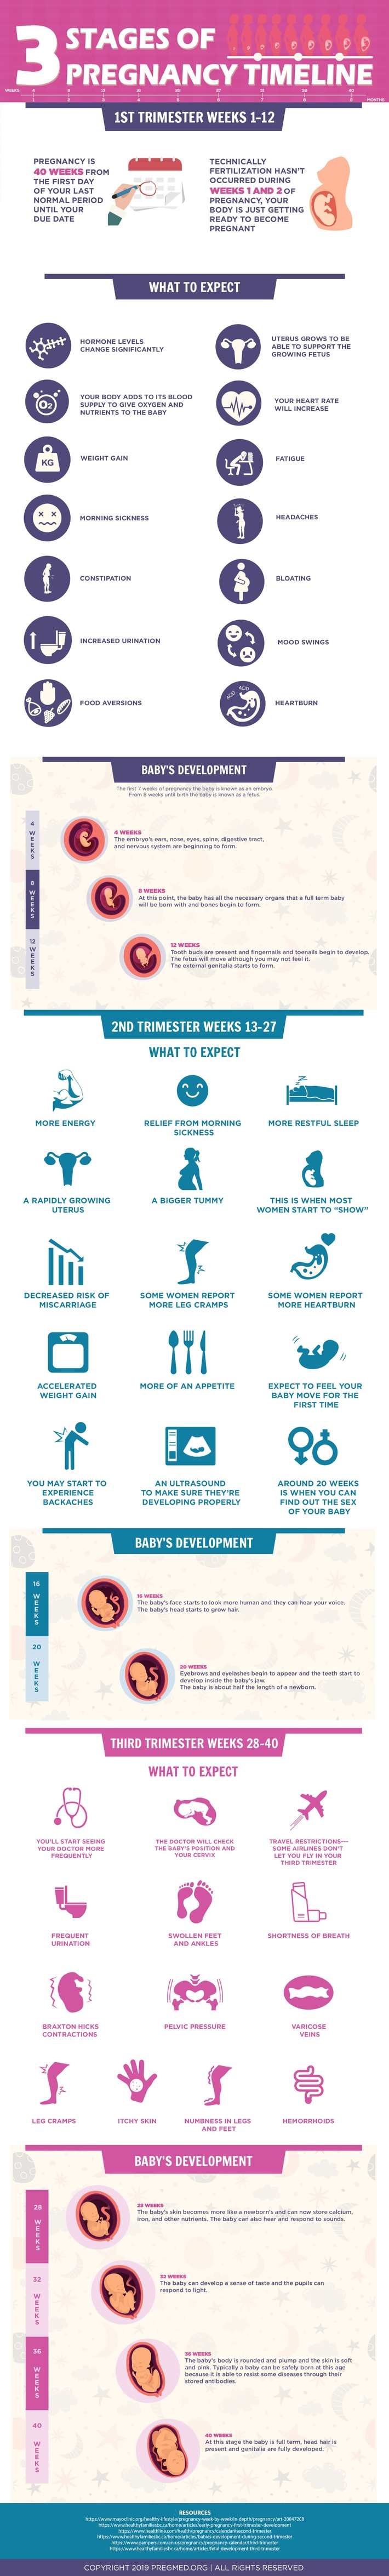 3 Stages of Pregnancy Timeline